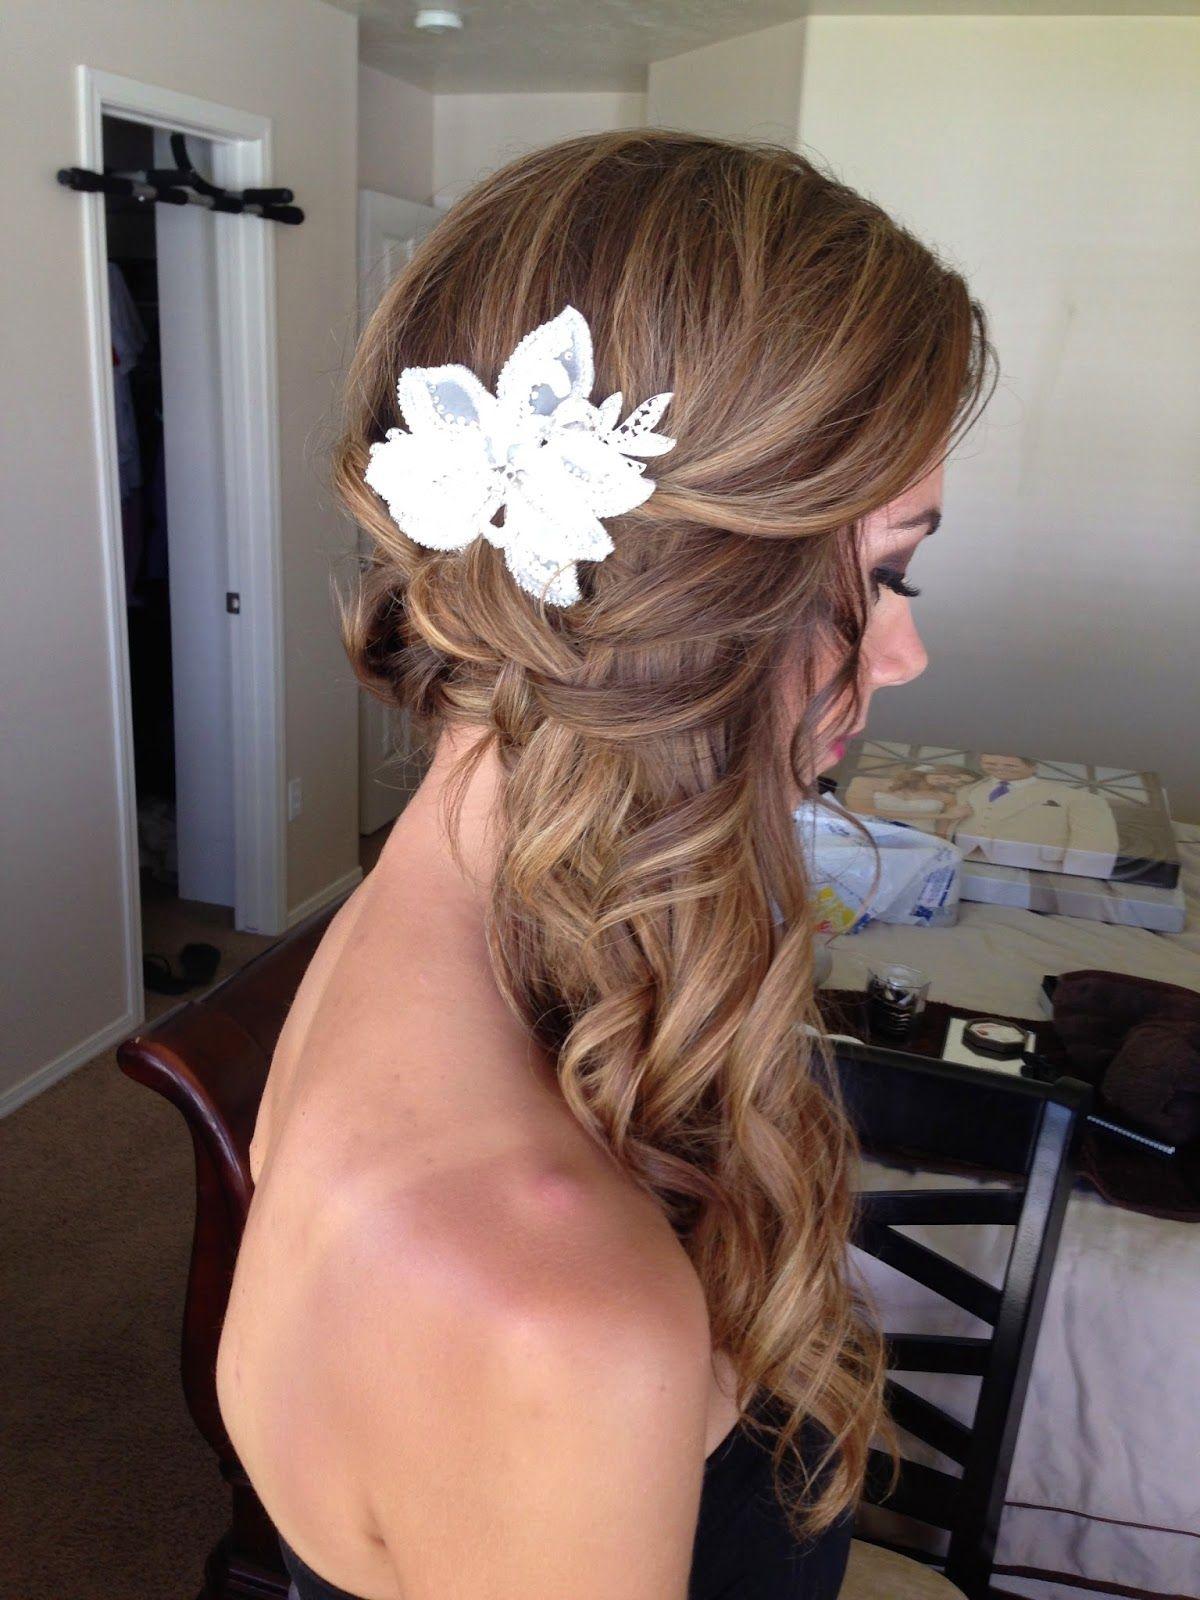 #alexcrabtreehairandmakeup wedding hairstyle updo